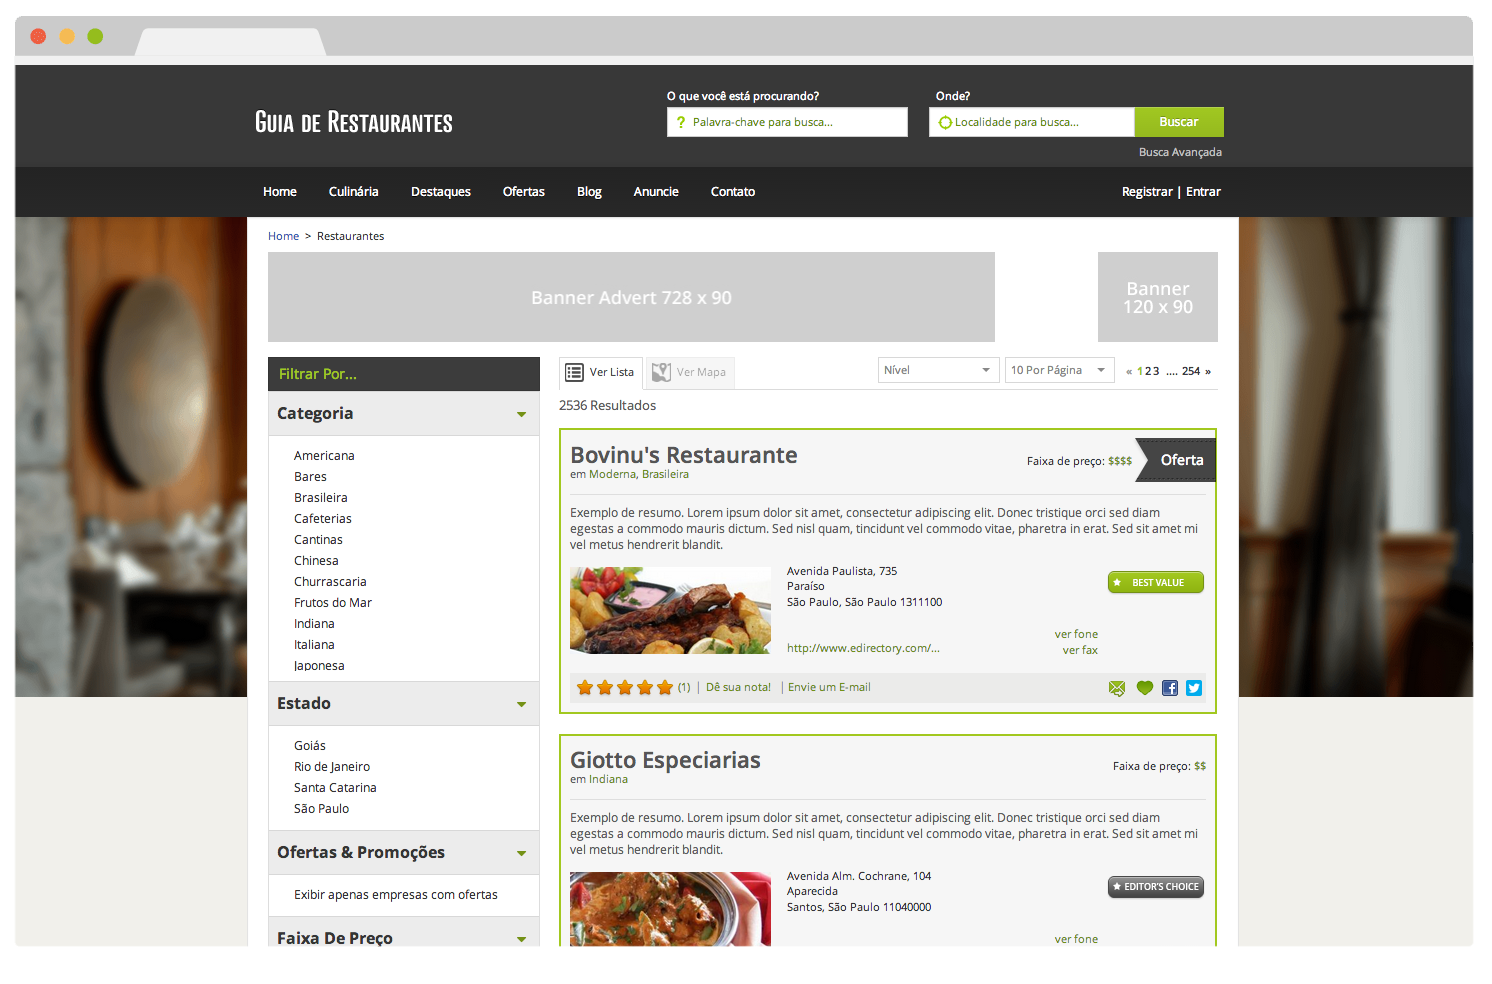 Tema eDirectory Guia de Restaurantes - Funcionalidade Faixa de Preço